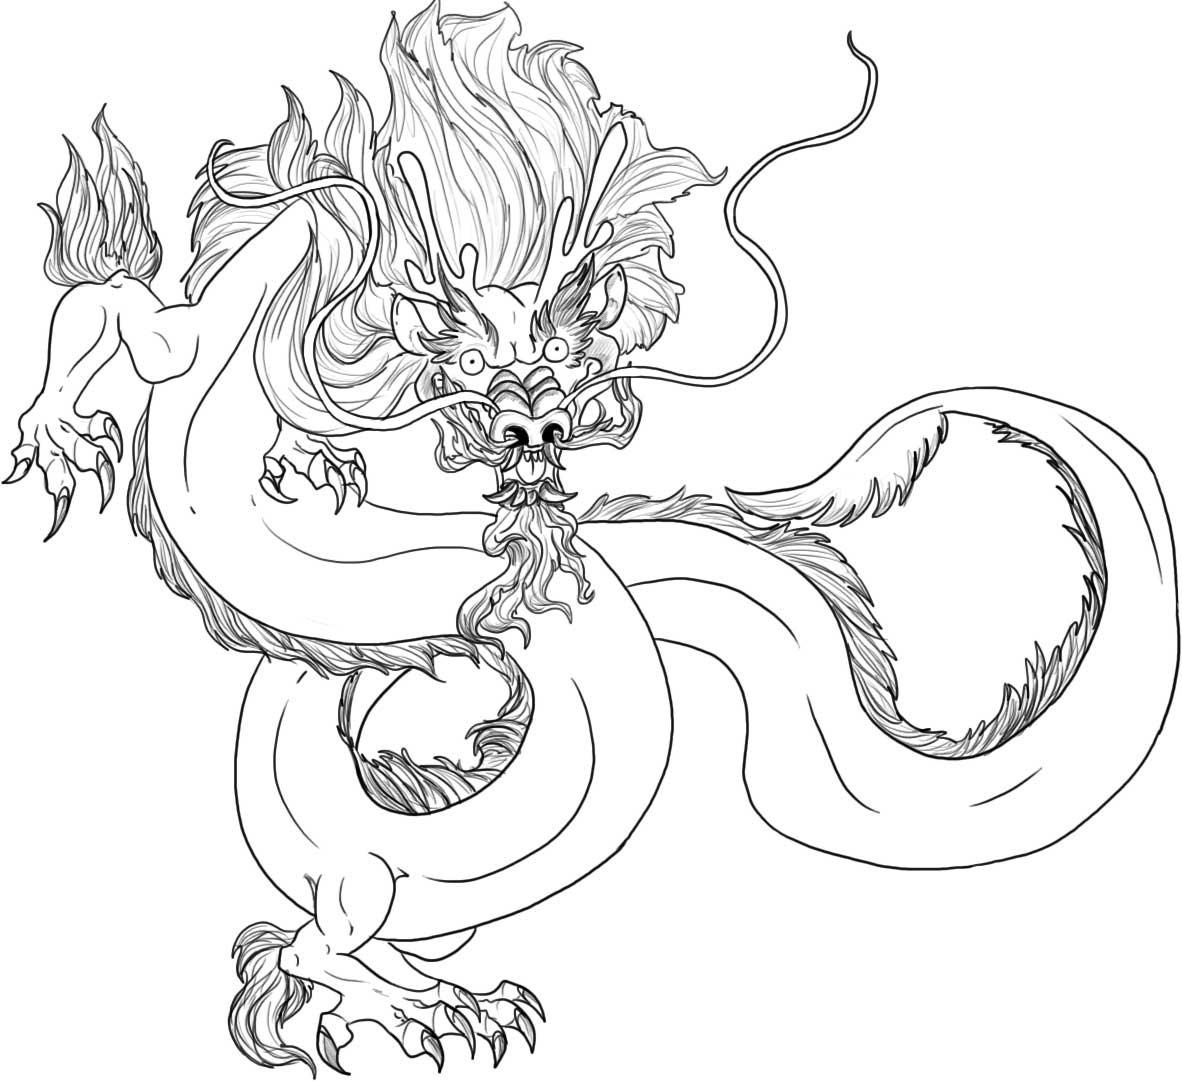 1182x1081 Drawn Chinese Dragon Medieval